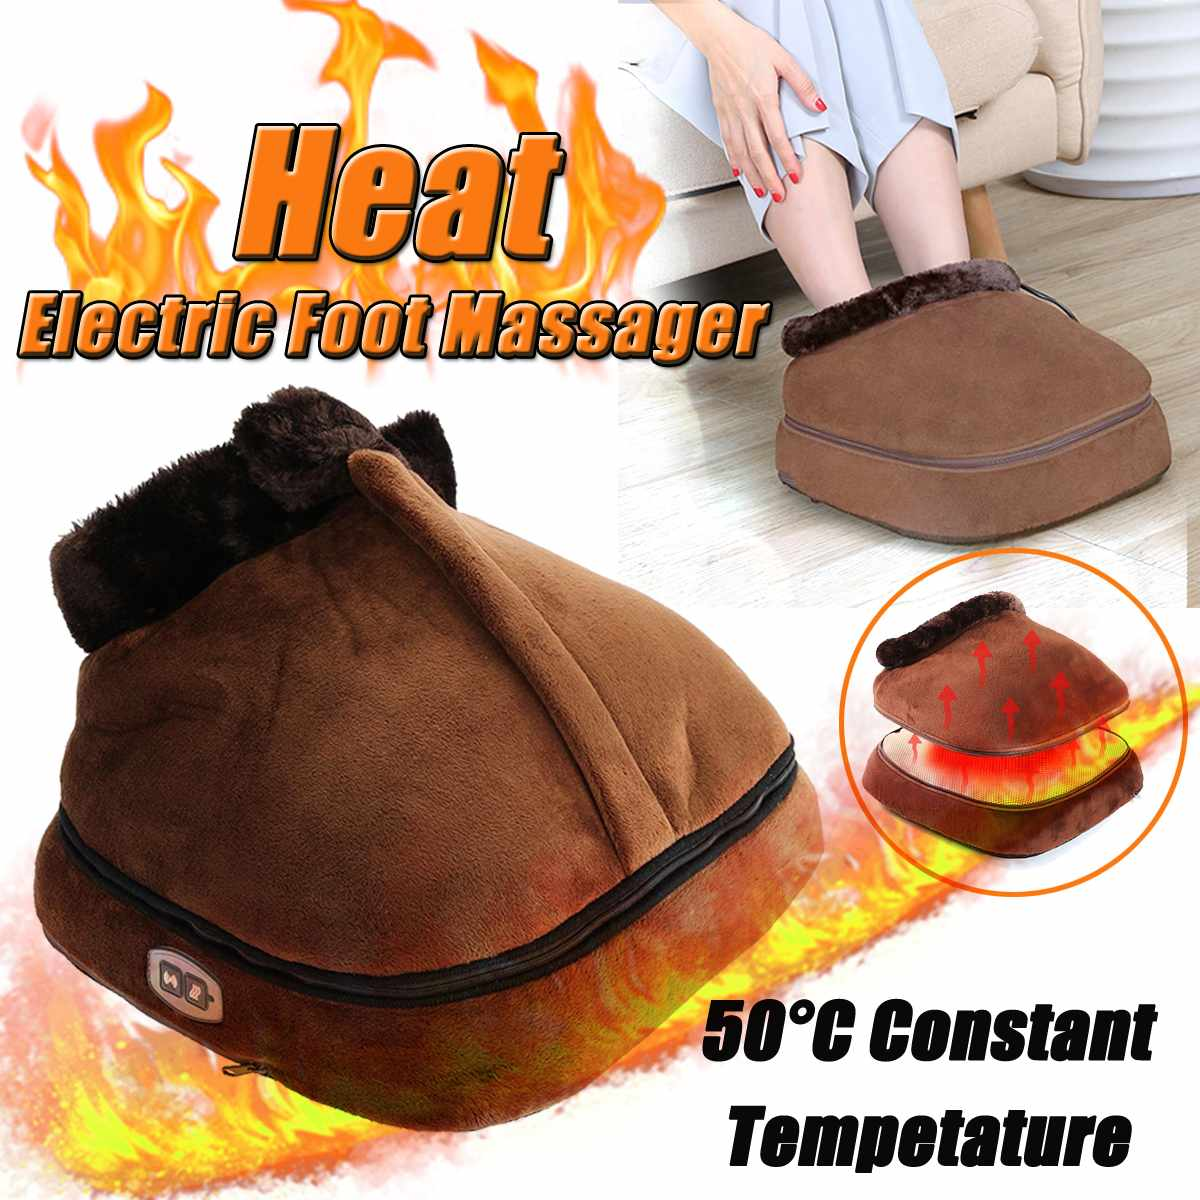 2 IN 1 Electric Heated Foot Warmer Cosy Unisex Velvet Feet Heated Foot Warmer Massager Big Slipper Foot Heat Warm Massage Shoes|Electric Heating Pads| |  -